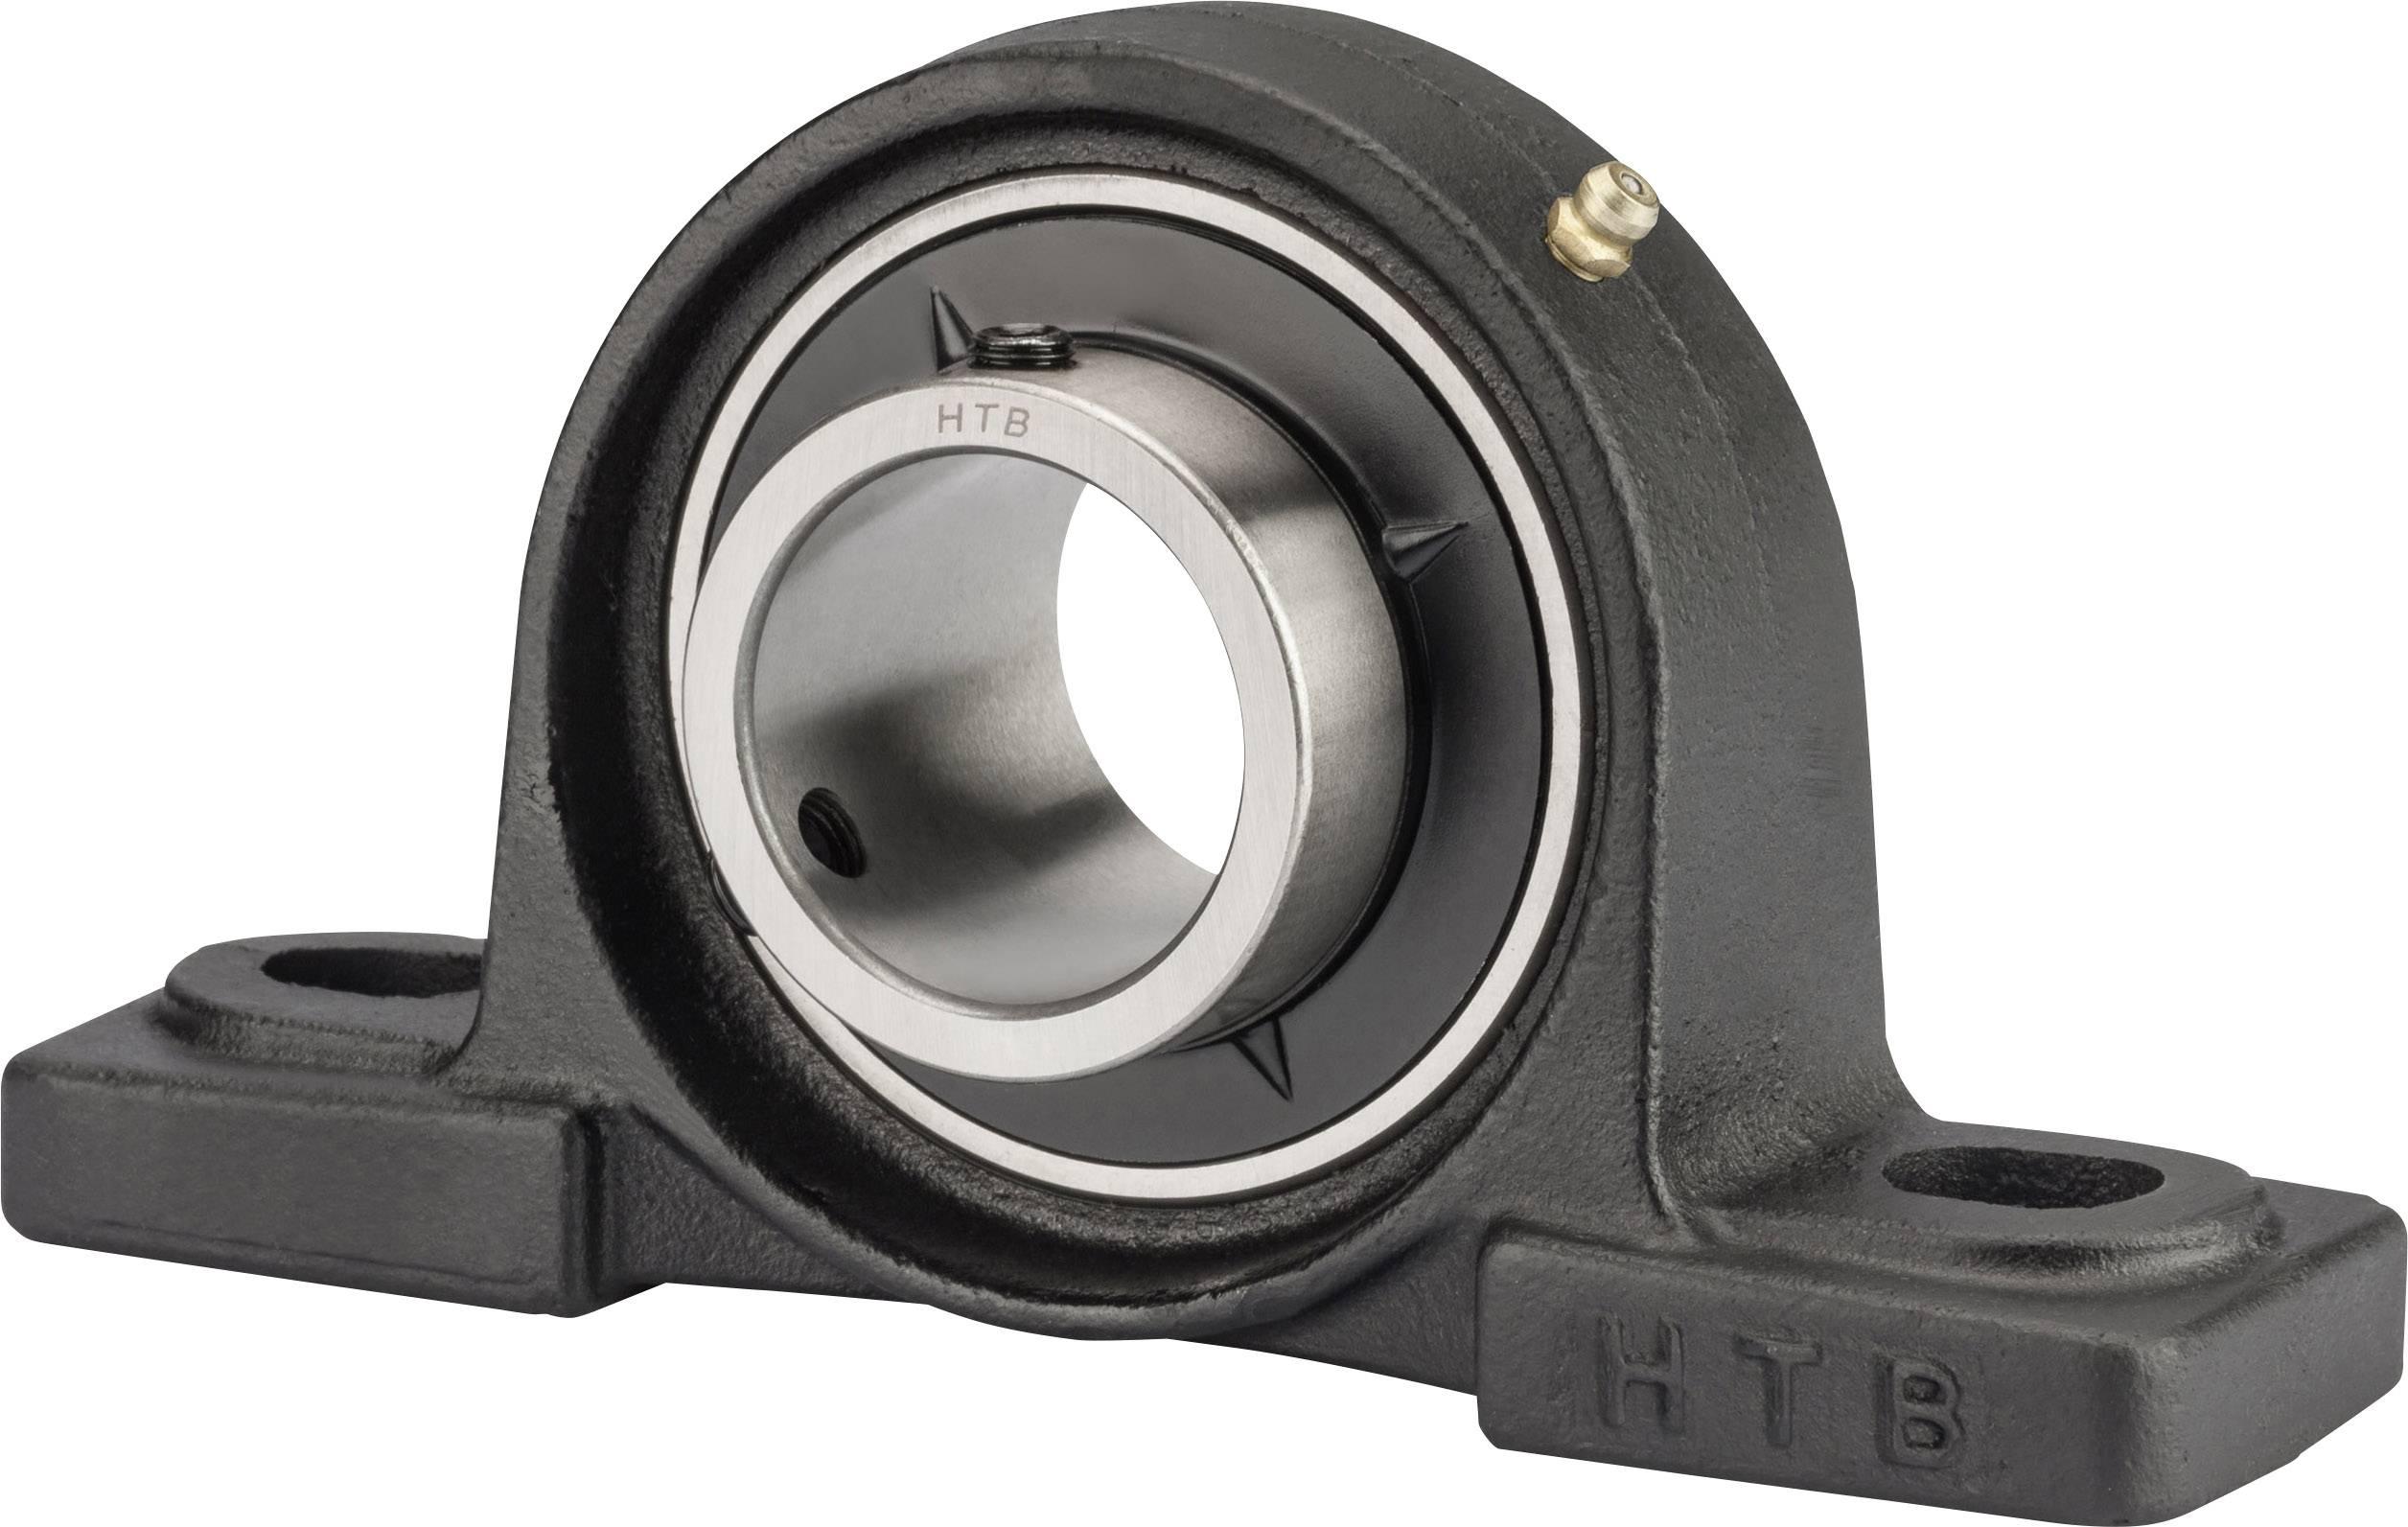 Htb Ucp 202 Staand Lager Gietijzer Boordiameter 15 Mm